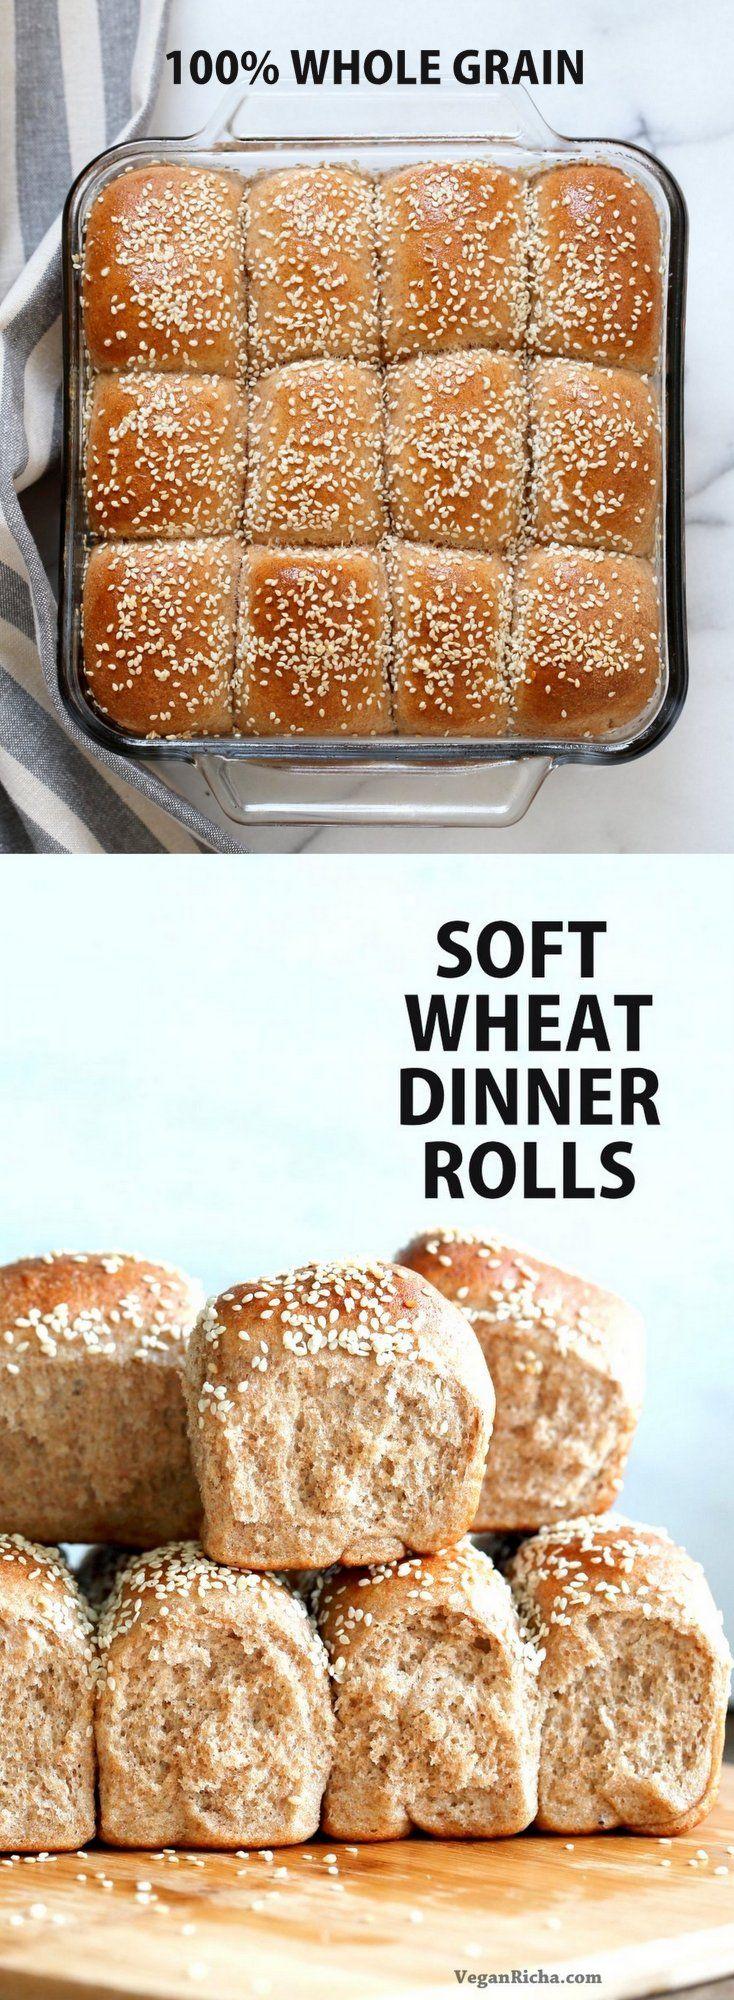 Soft Whole Wheat Dinner Rolls - Vegan Richa